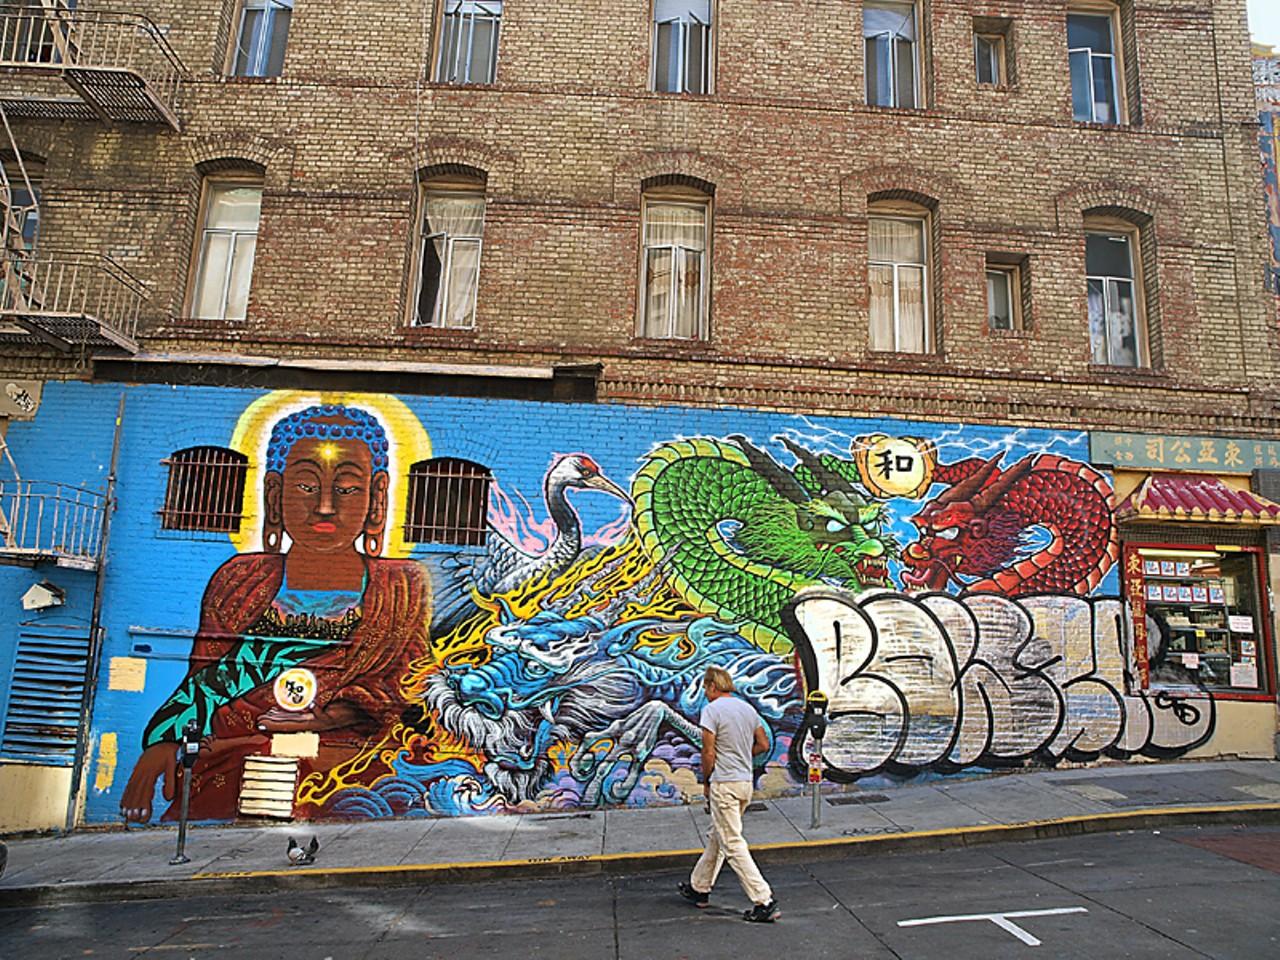 Graffiti wall writing - It S Graffiti